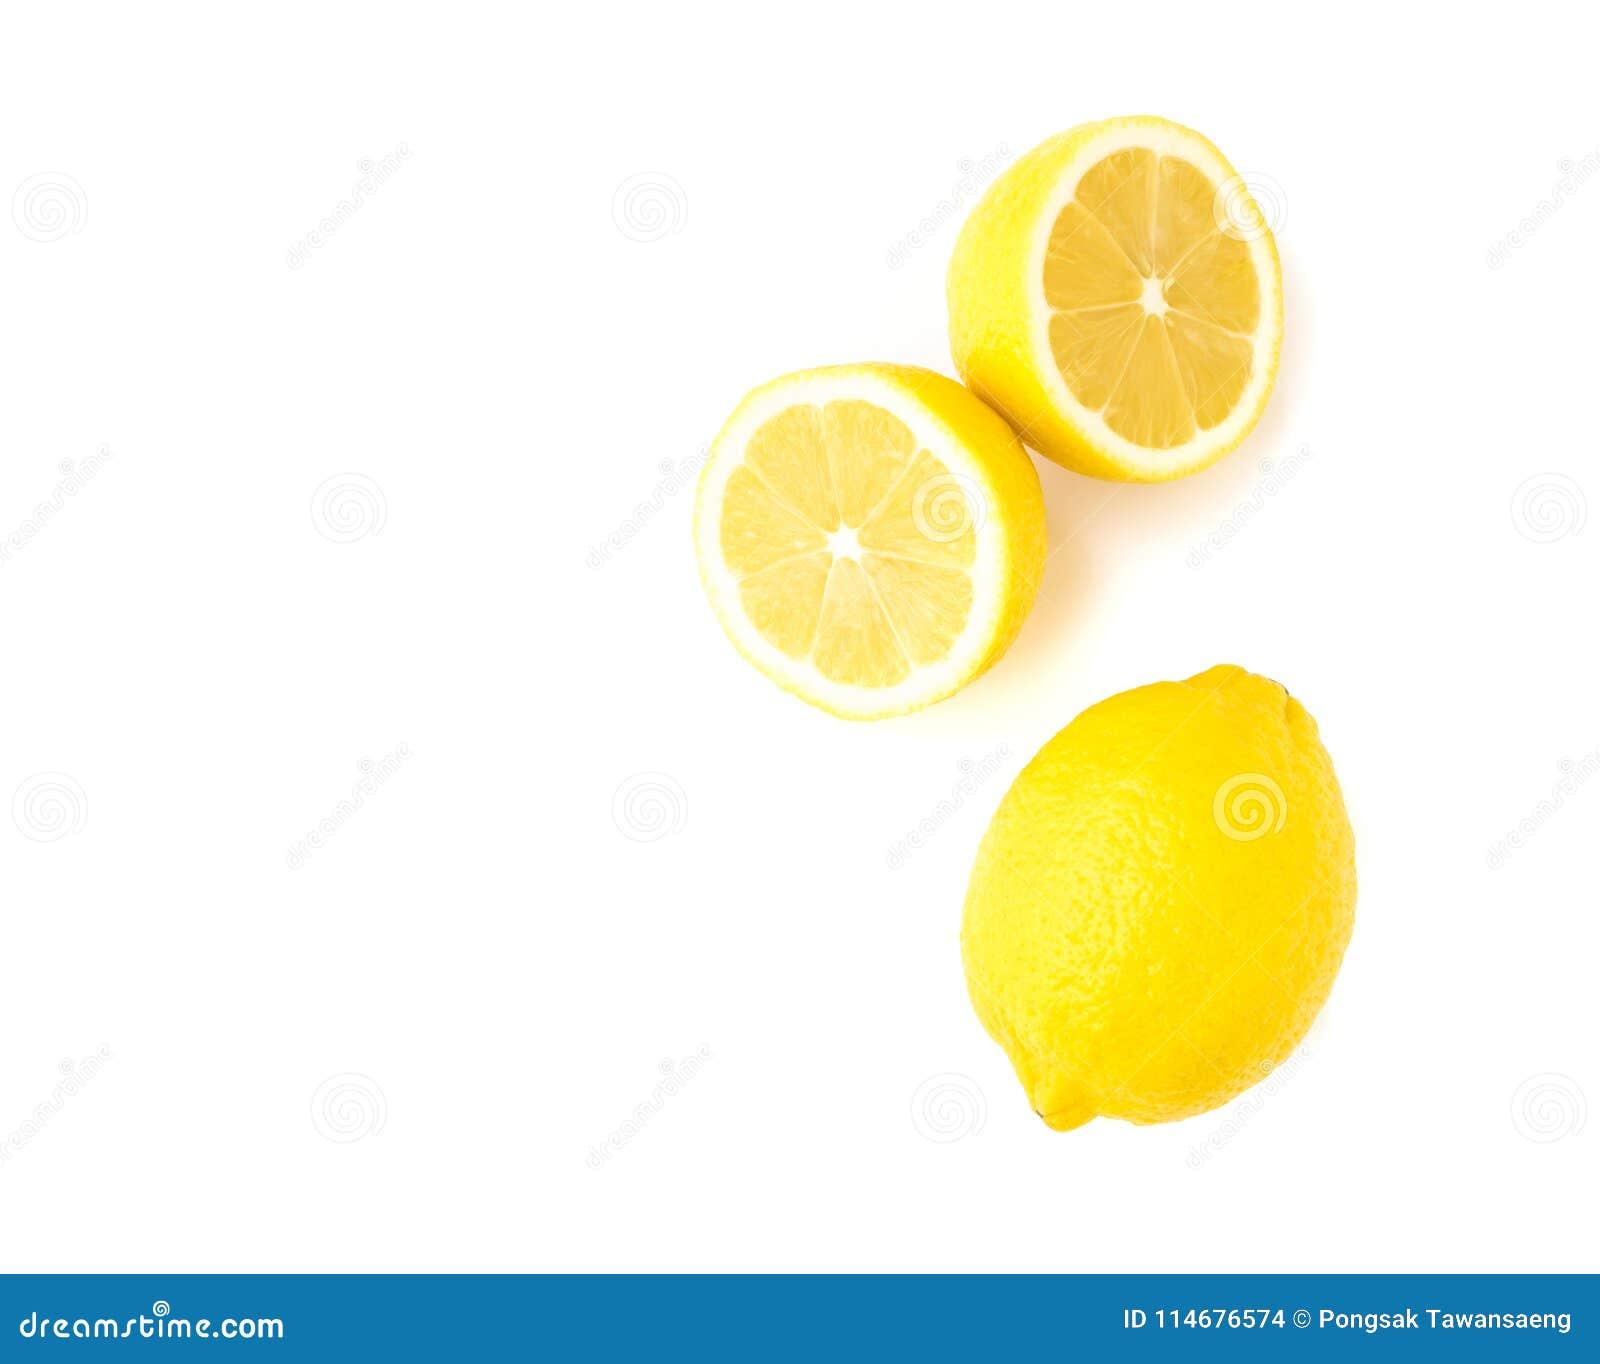 Closeup top view fresh lemon fruit slice on white background